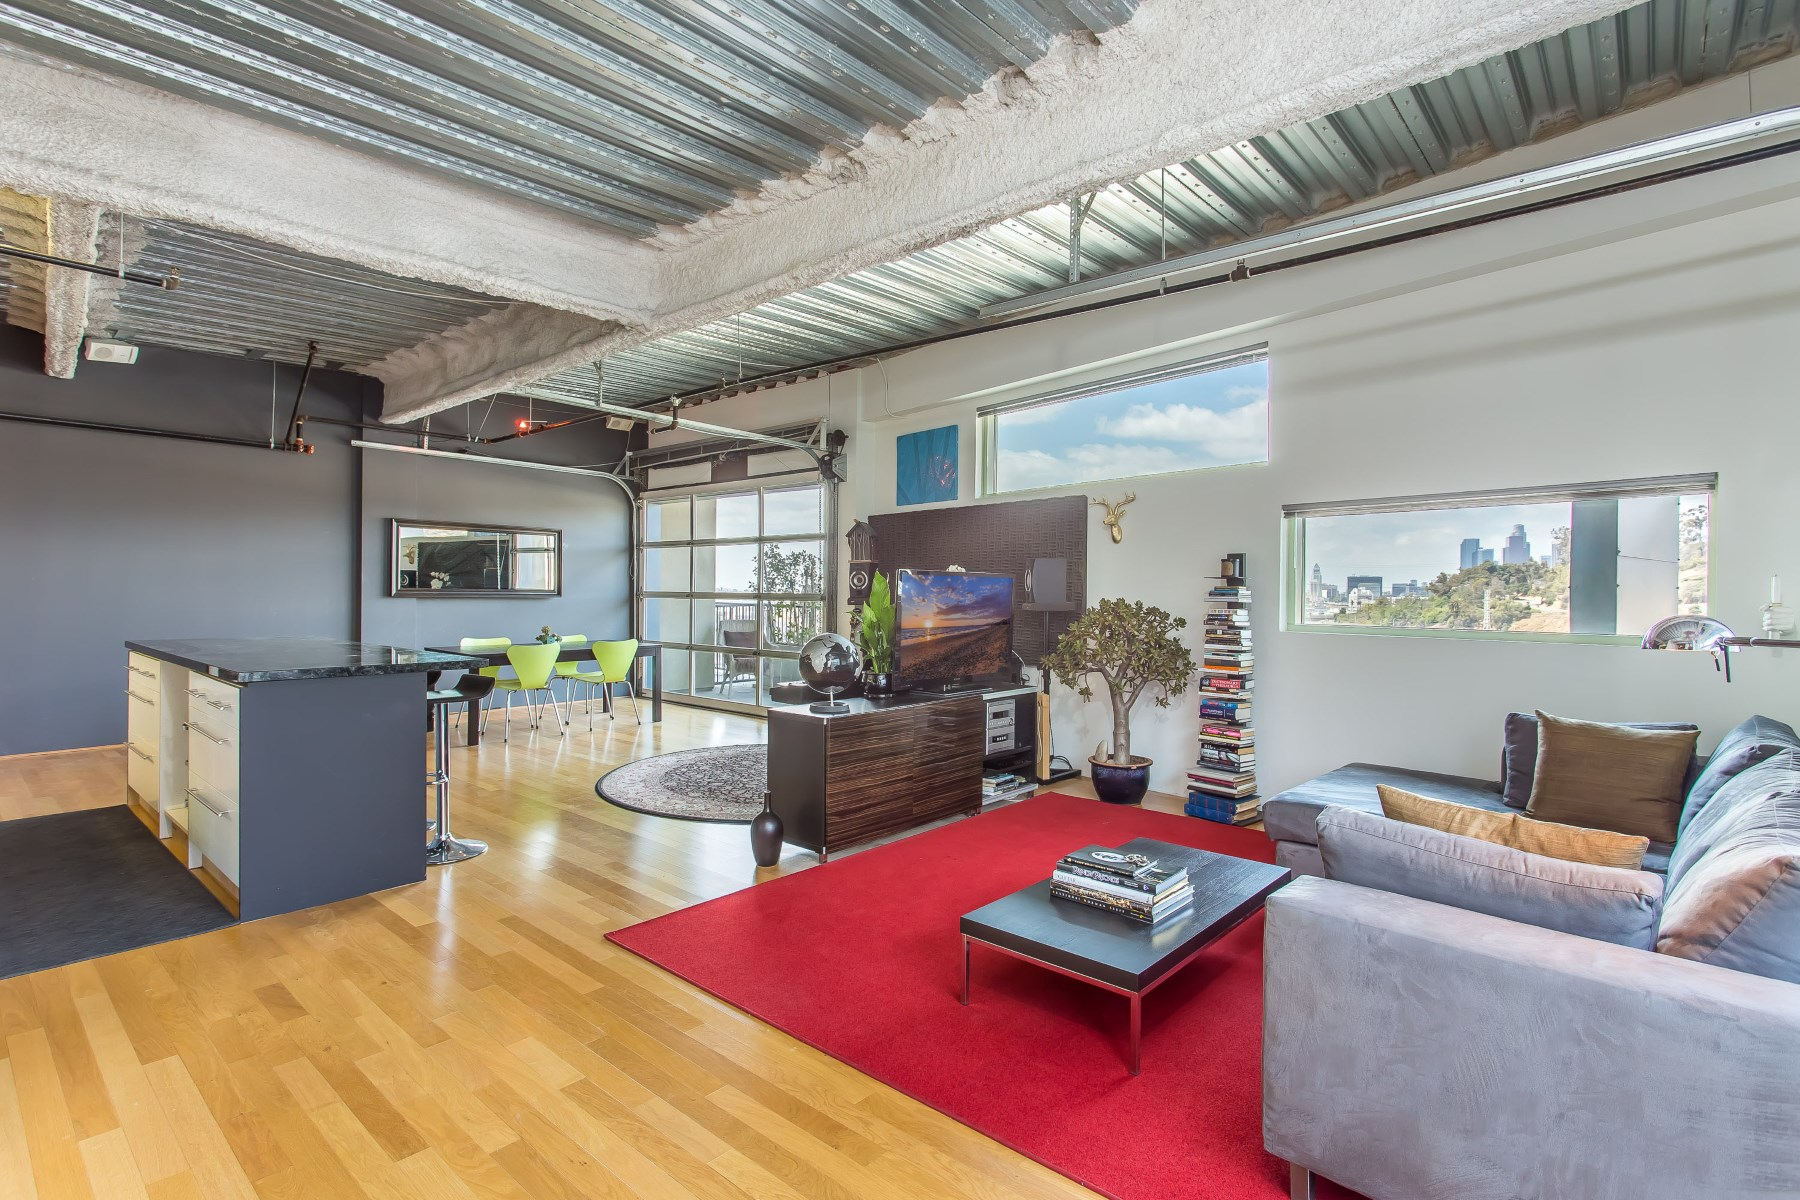 Кооперативная квартира для того Продажа на Modern Lincoln Heights Penthouse 200 N San Fernando Rd #612 Downtown Los Angeles, Los Angeles, Калифорния, 90031 Соединенные Штаты